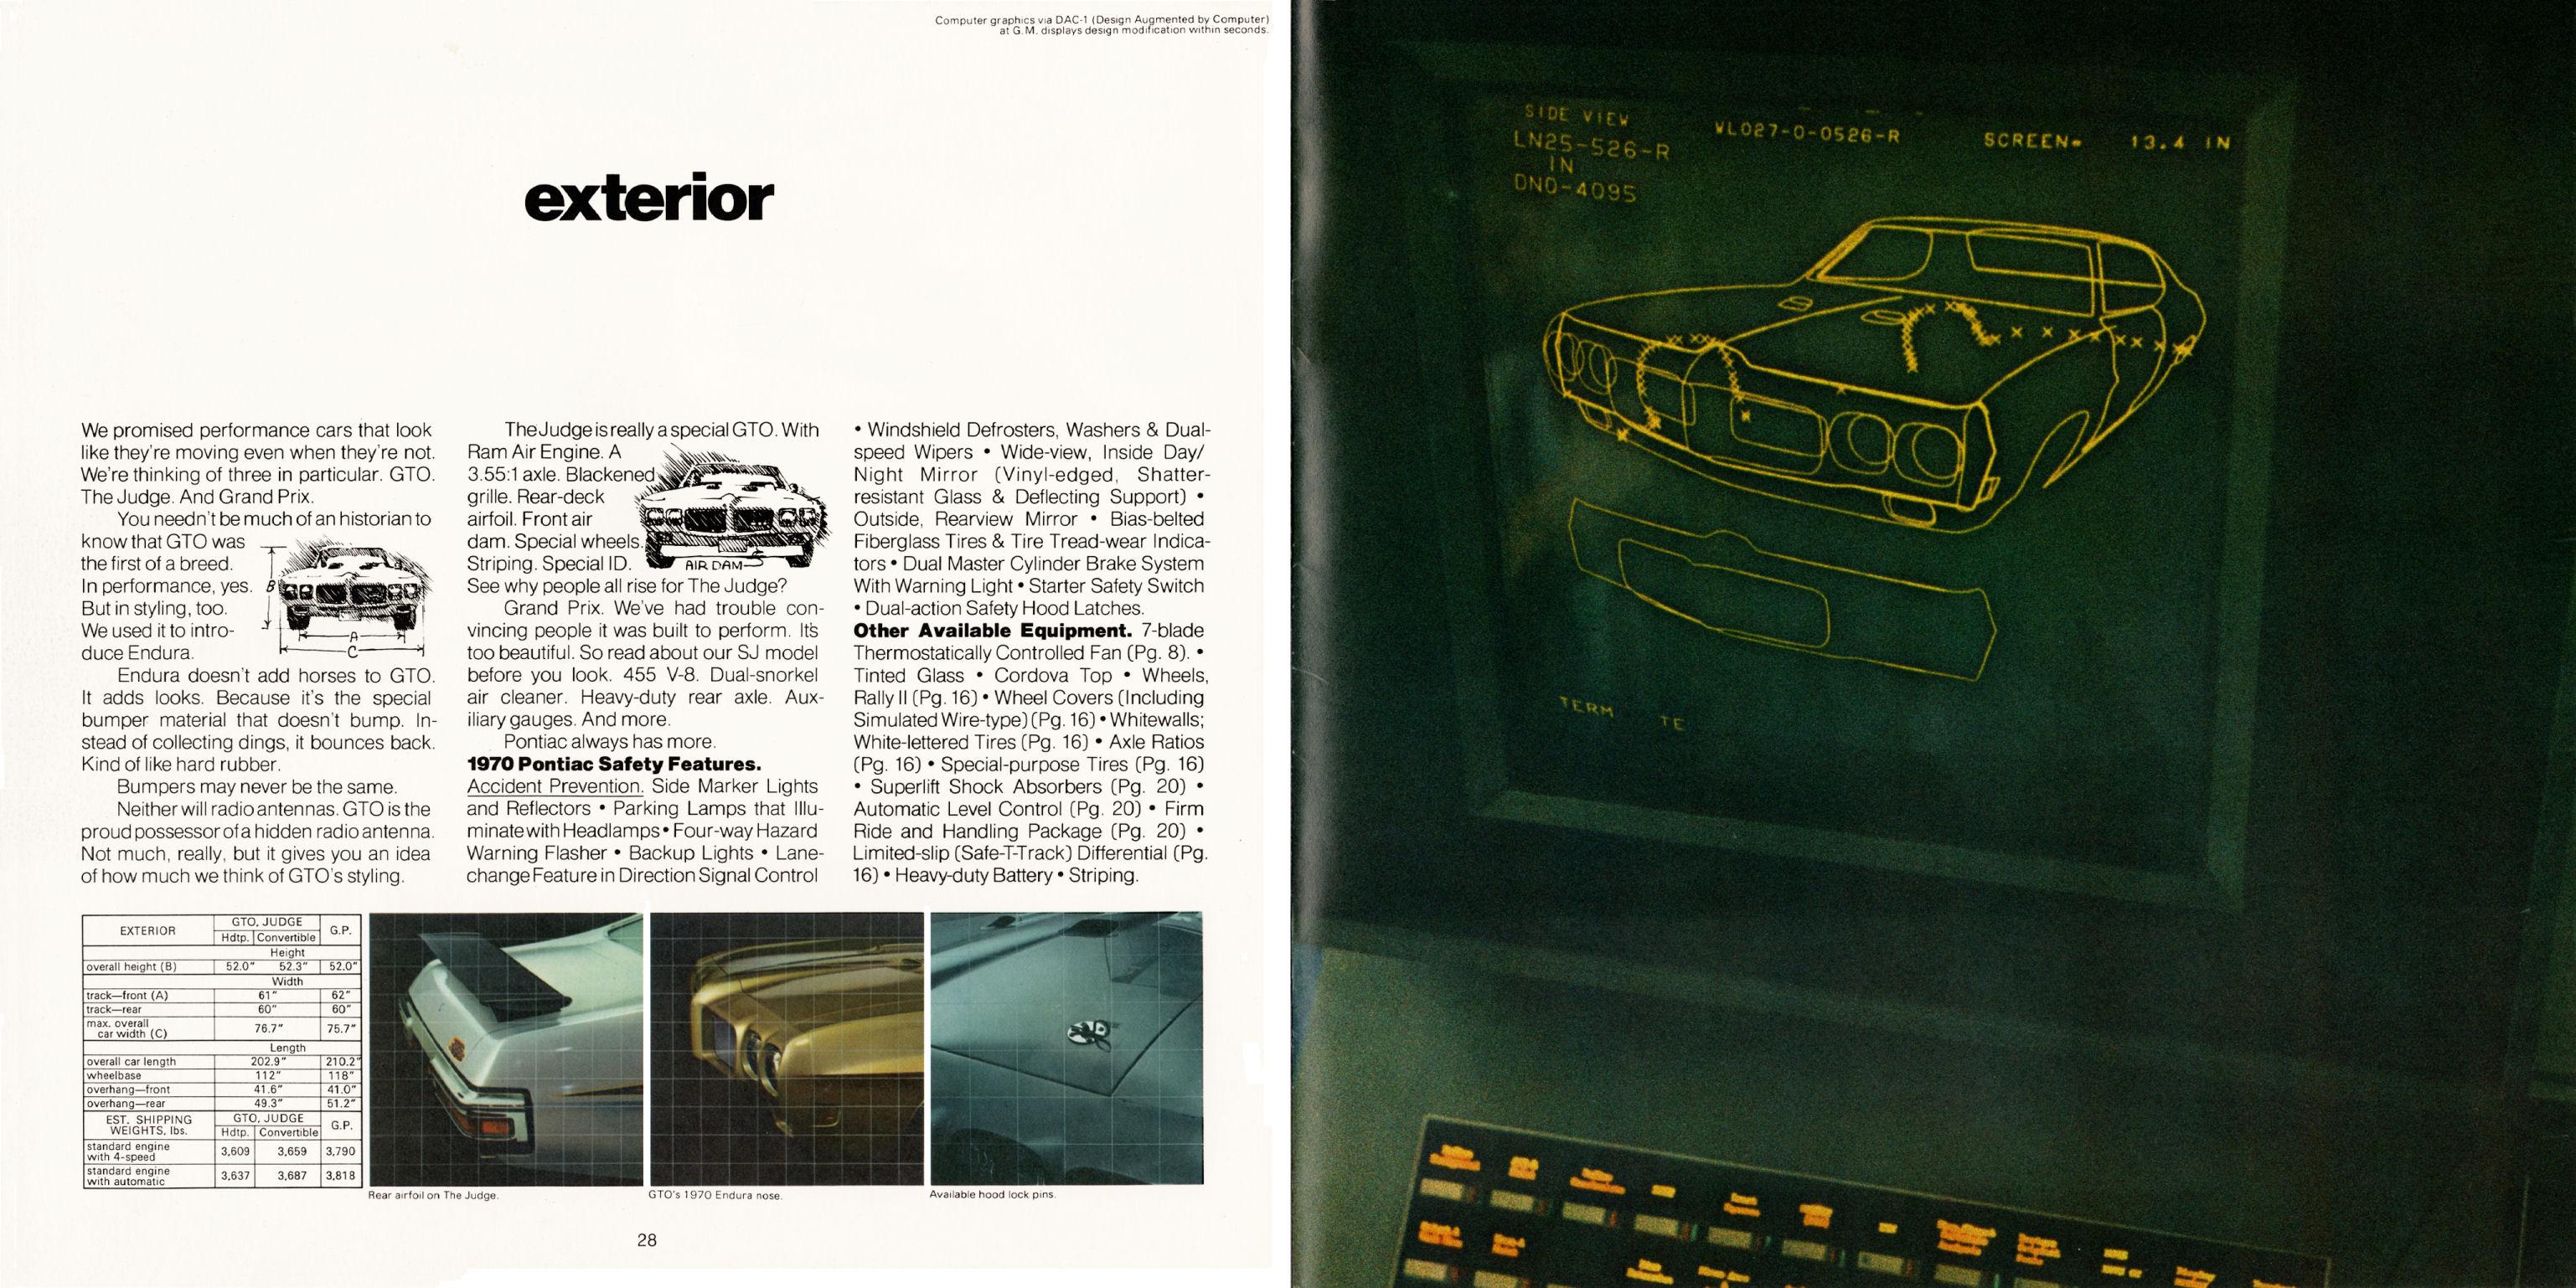 1970%20Pontiac%20Performance-28-29.jpg